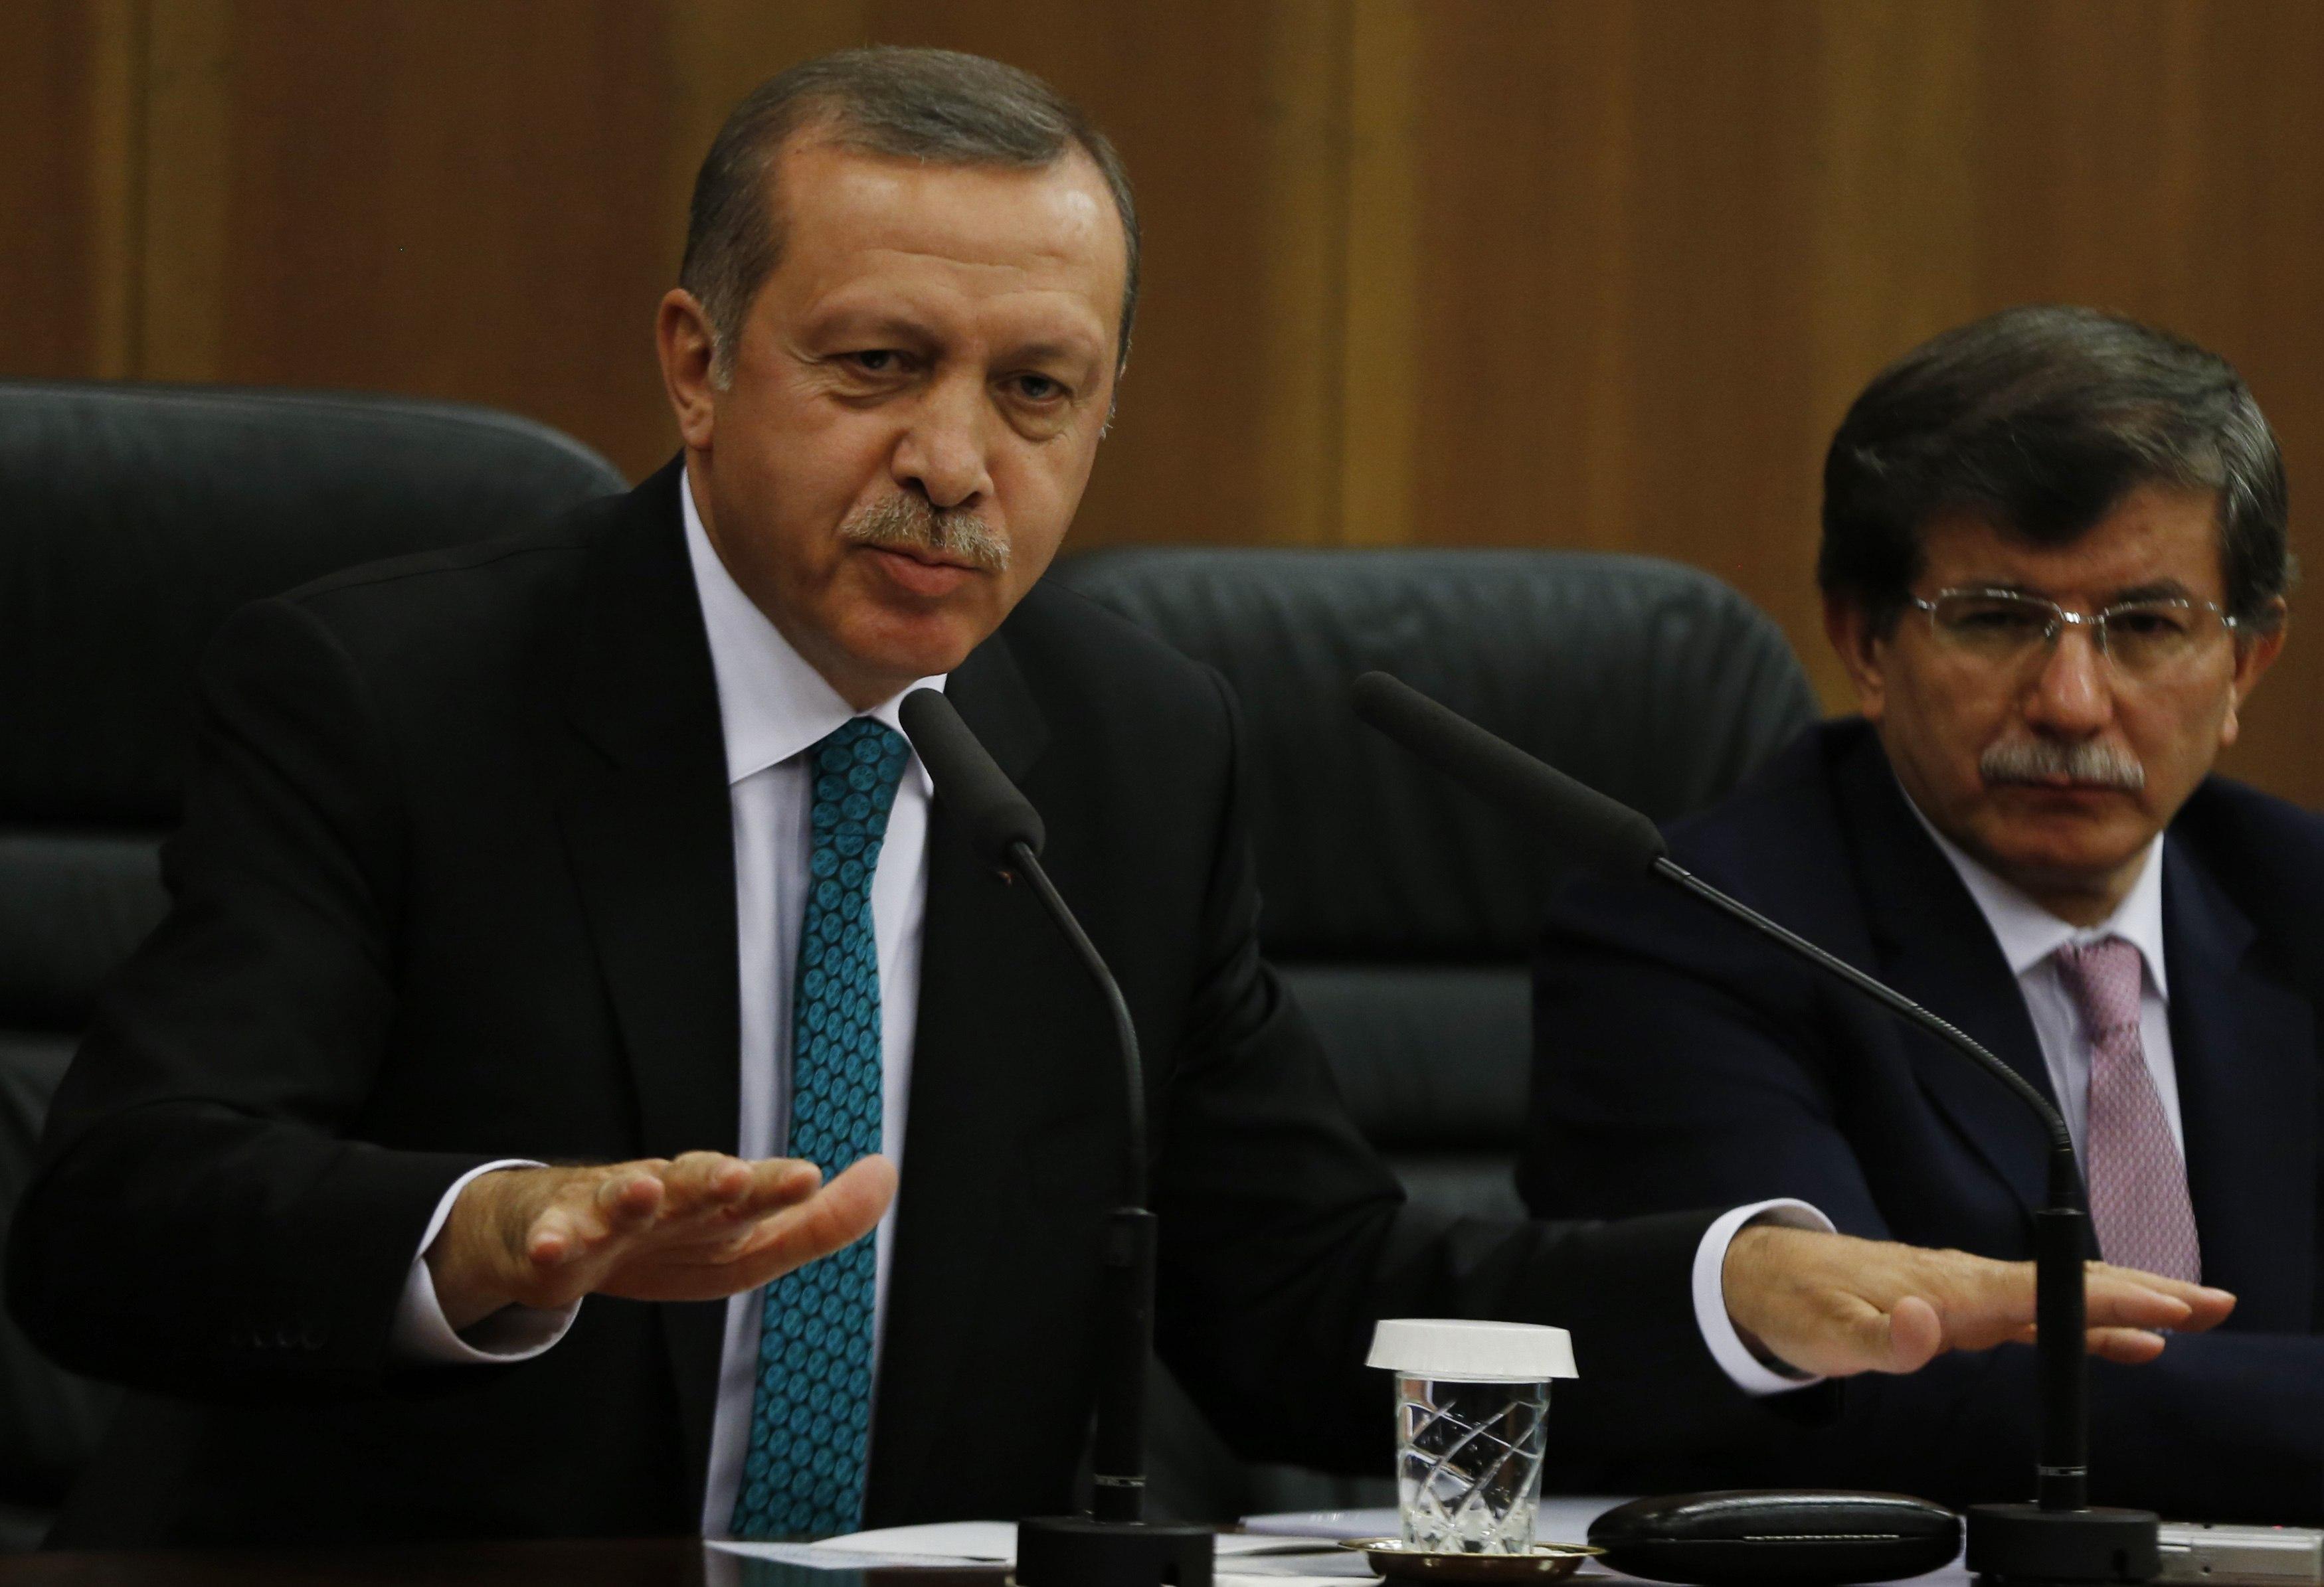 AKP'nin gündeminde Nokta Dergisi var